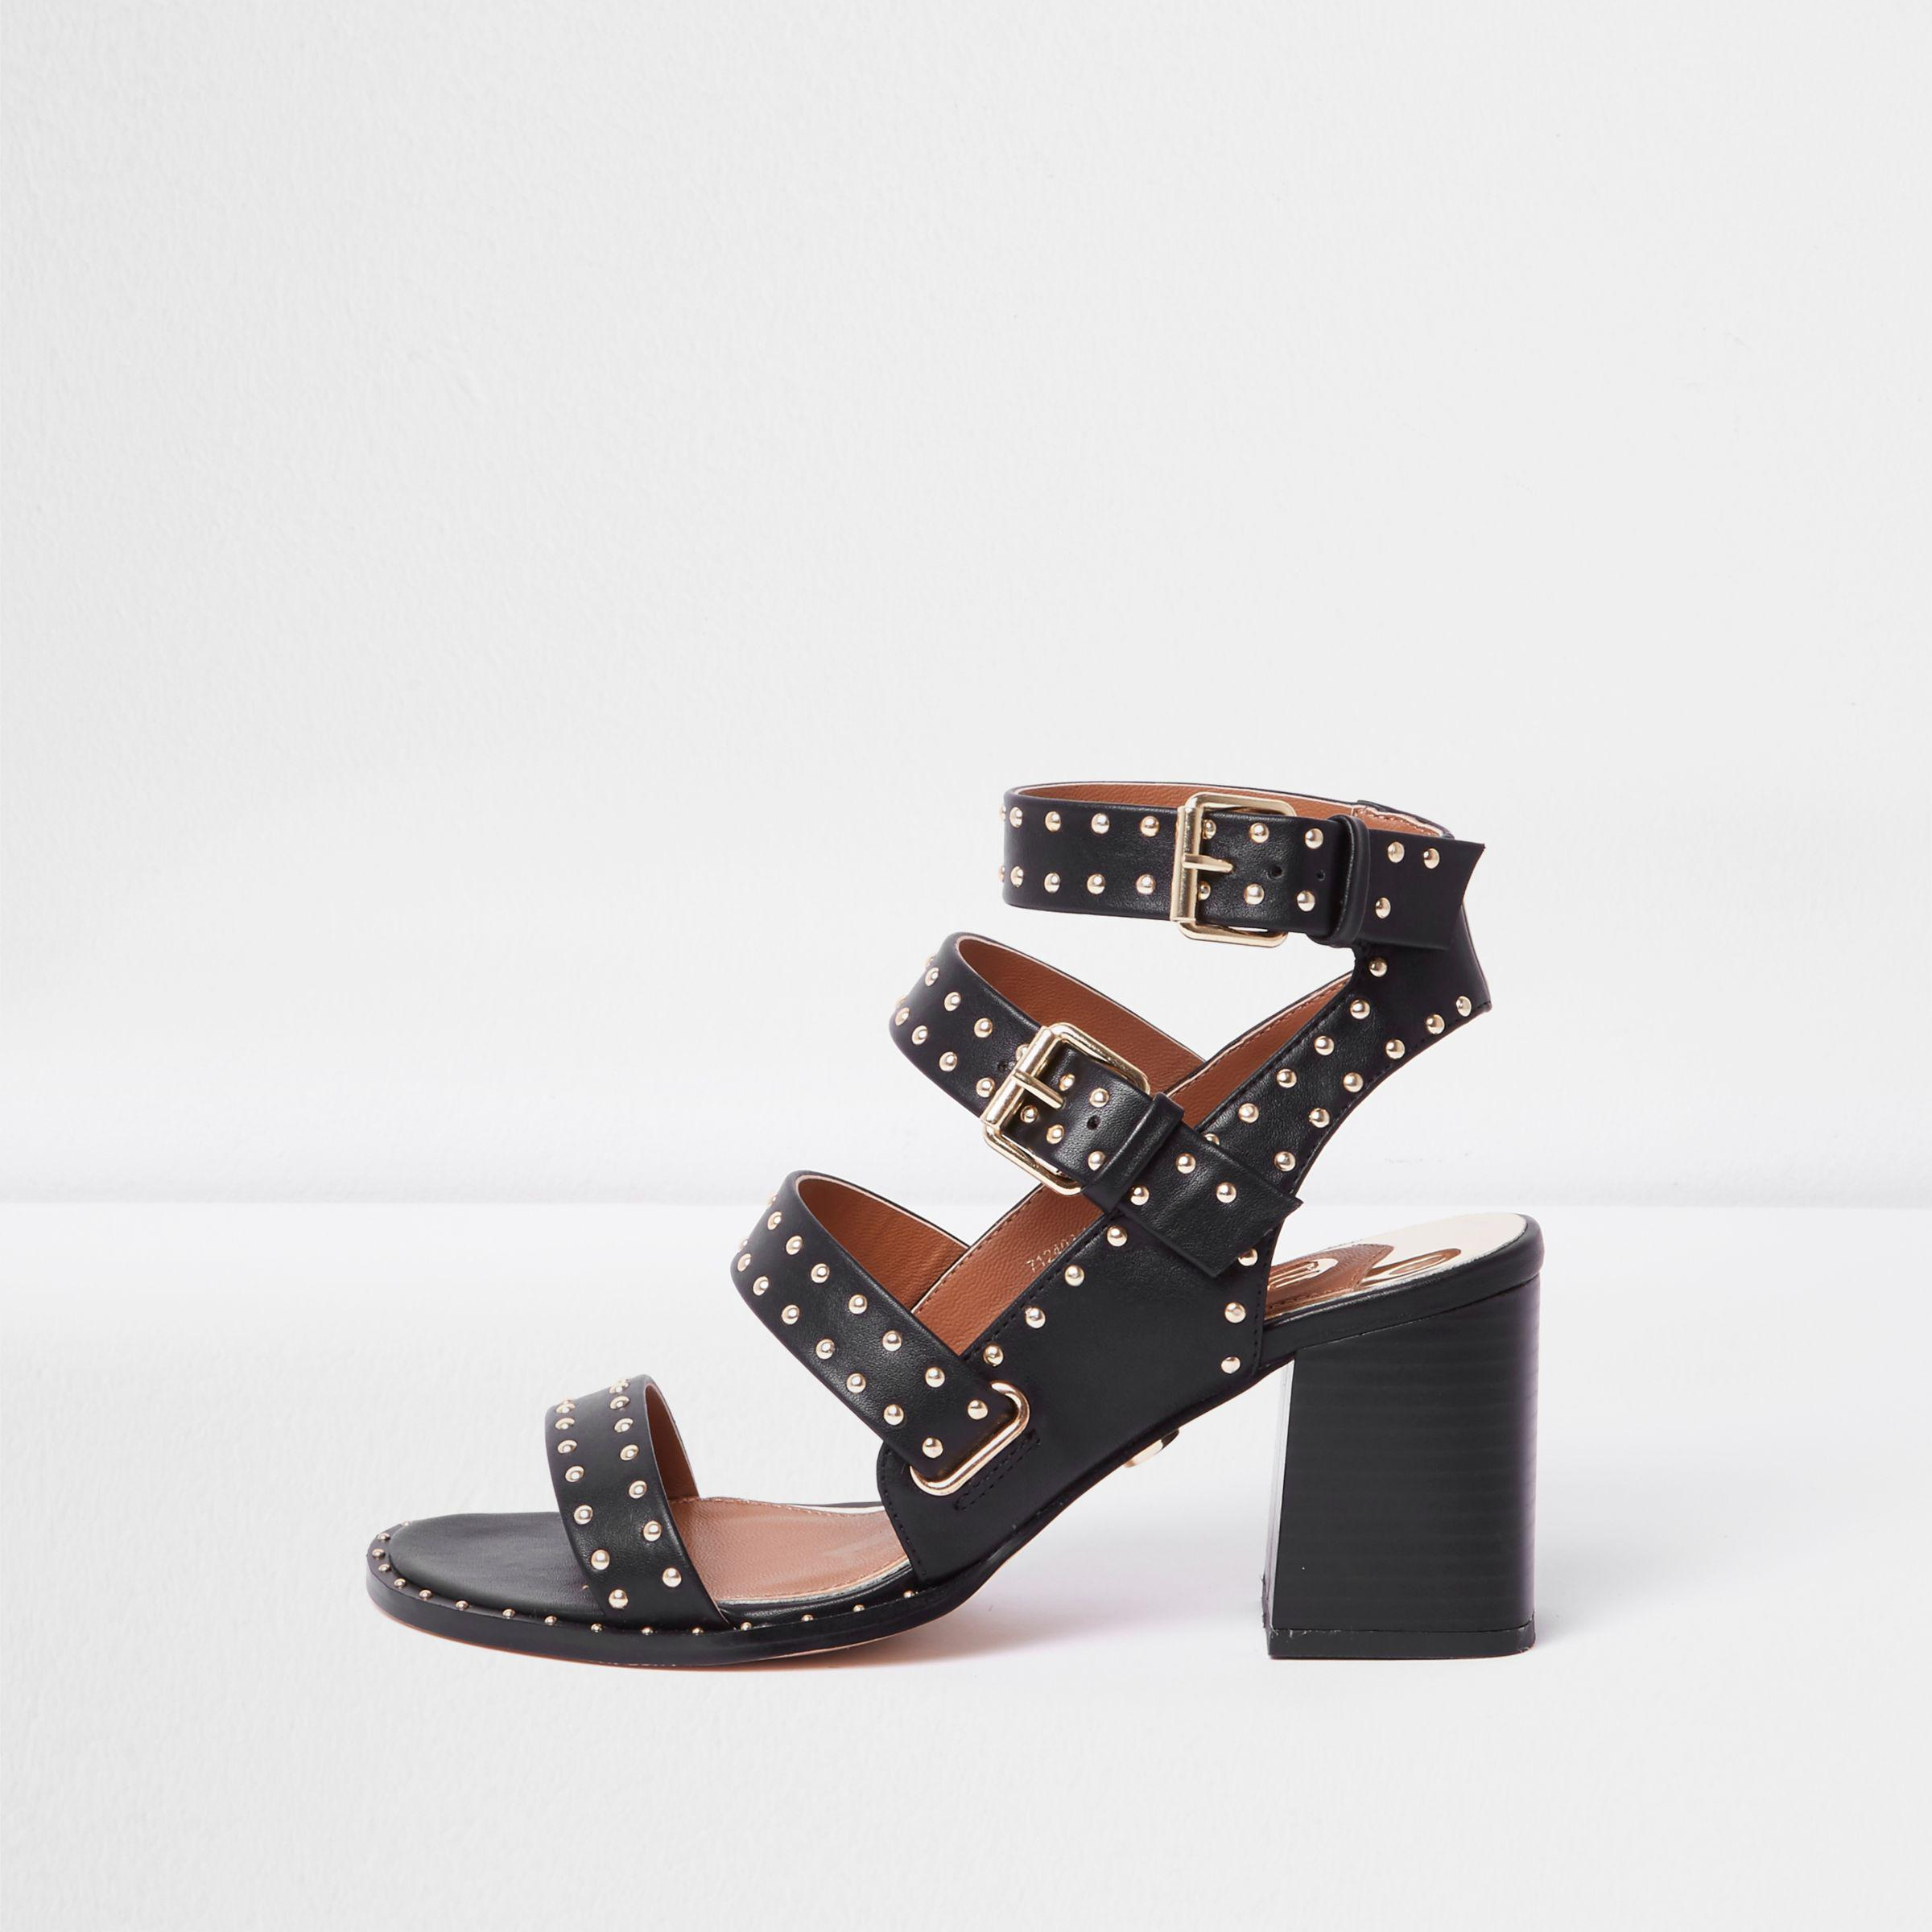 63727e2f992f Lyst - River Island Black Studded Strappy Block Heel Sandals in Black